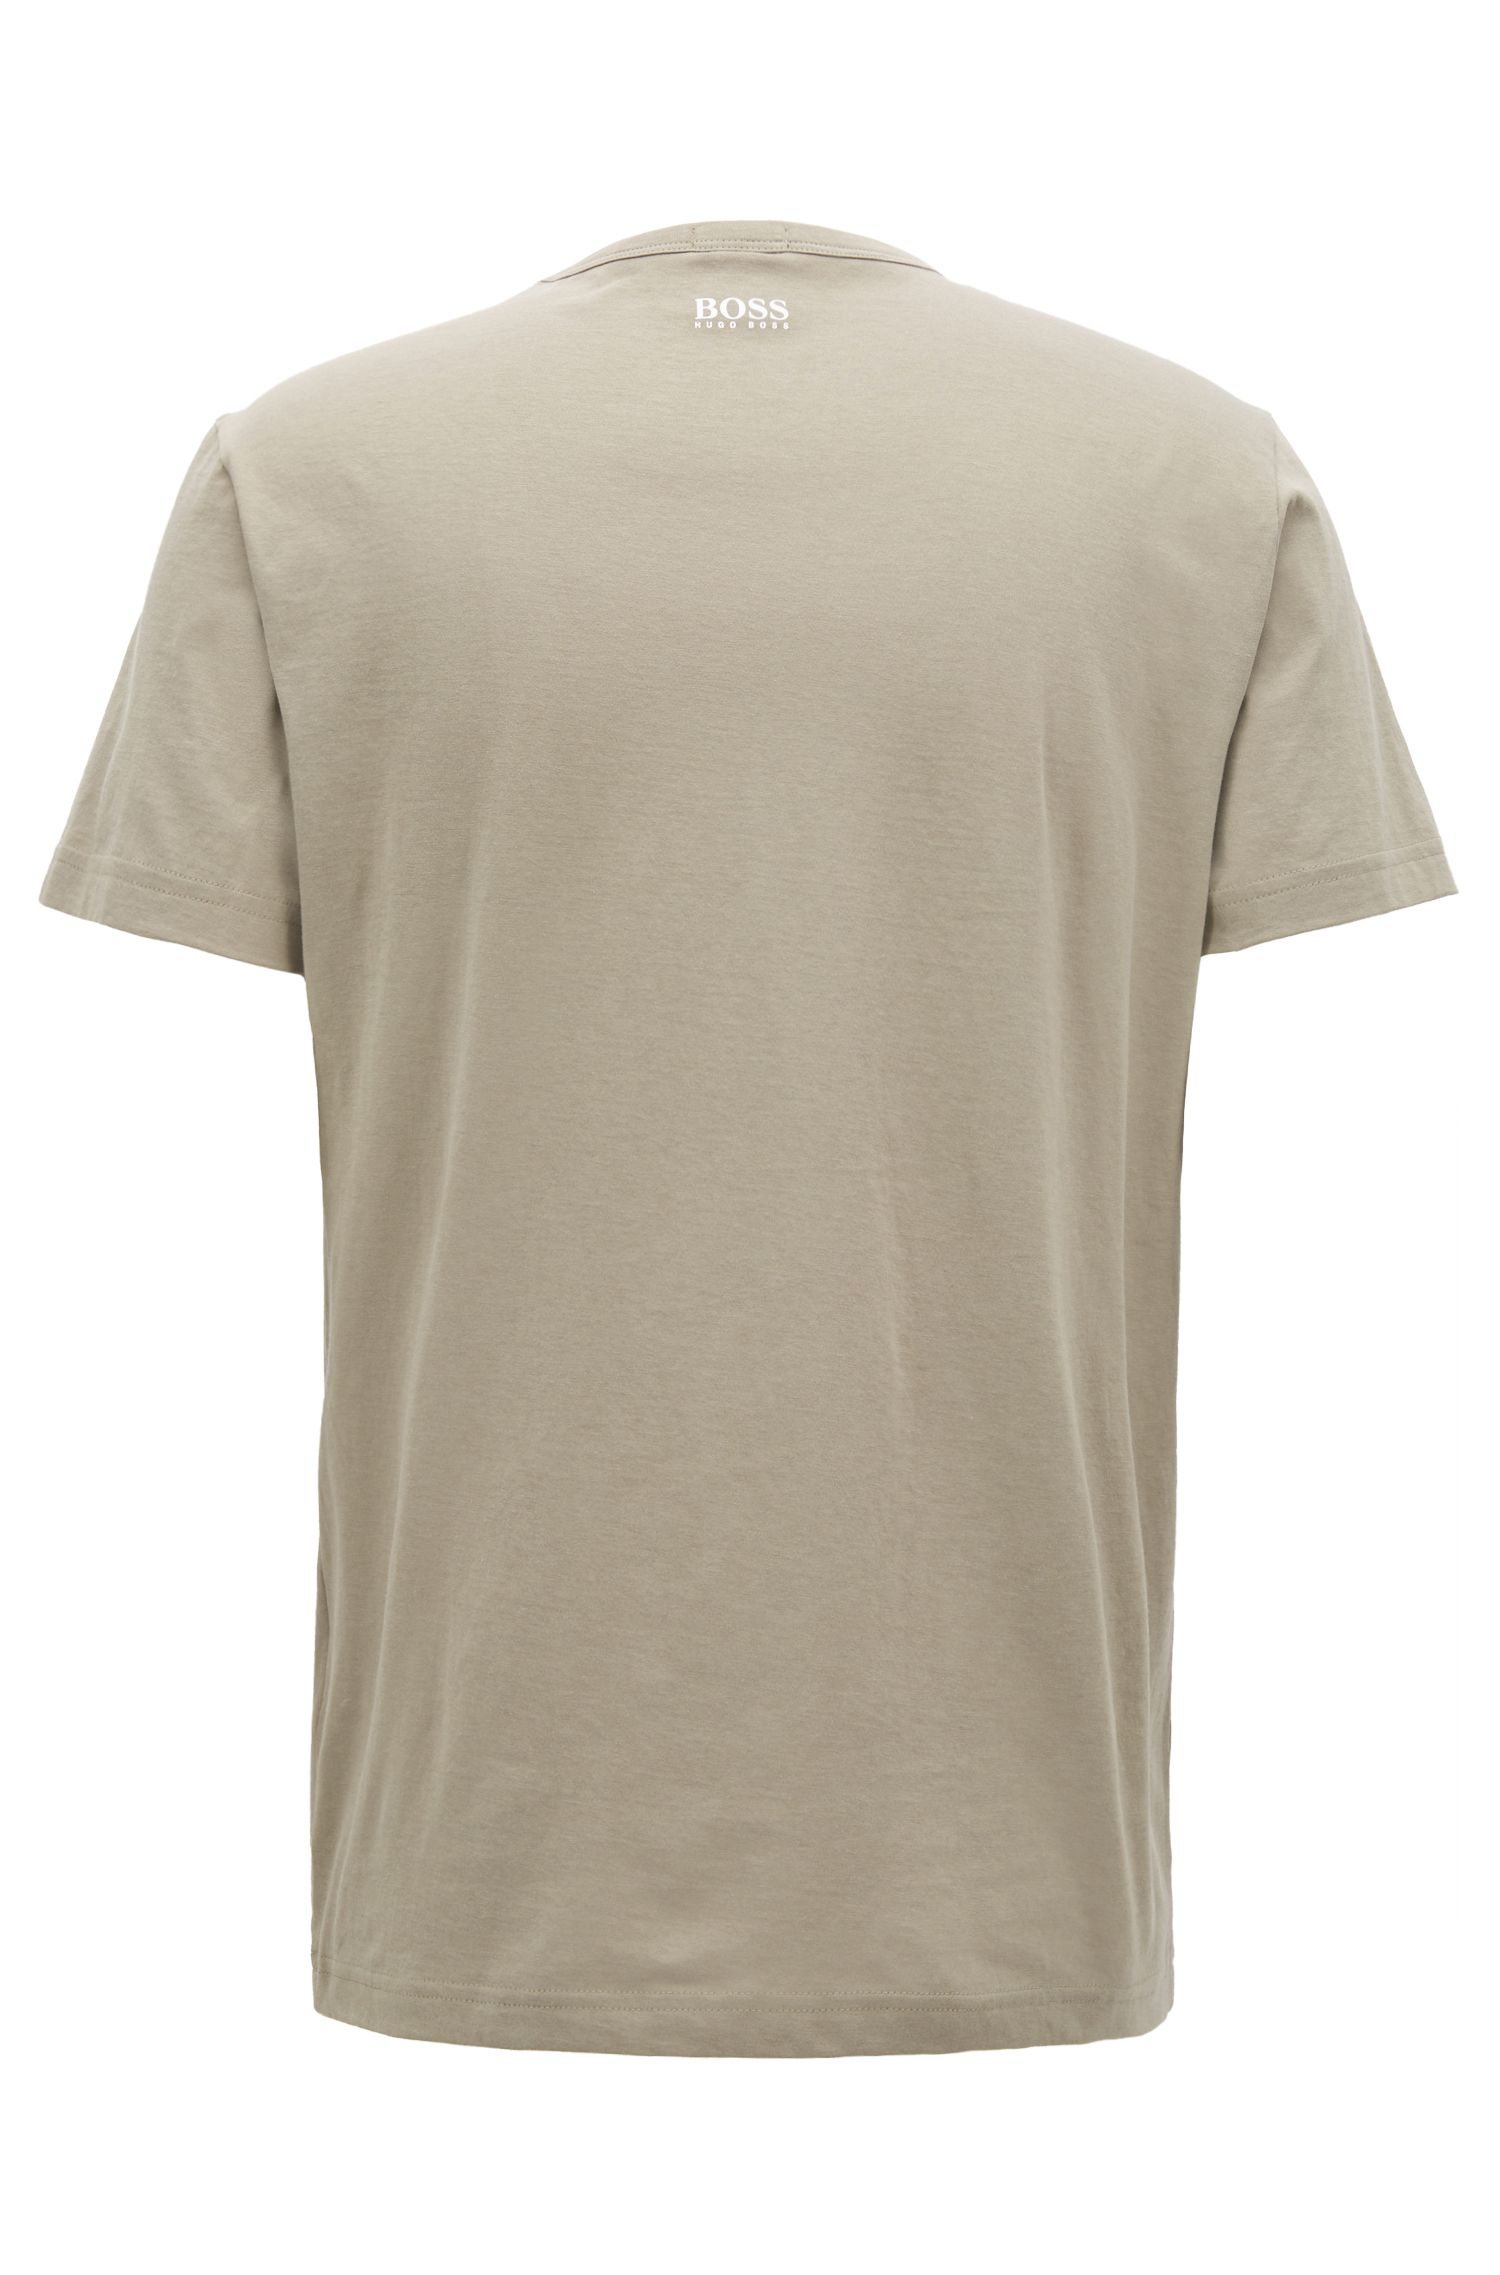 Katoenen T-shirt met dynamisch kunstdessin